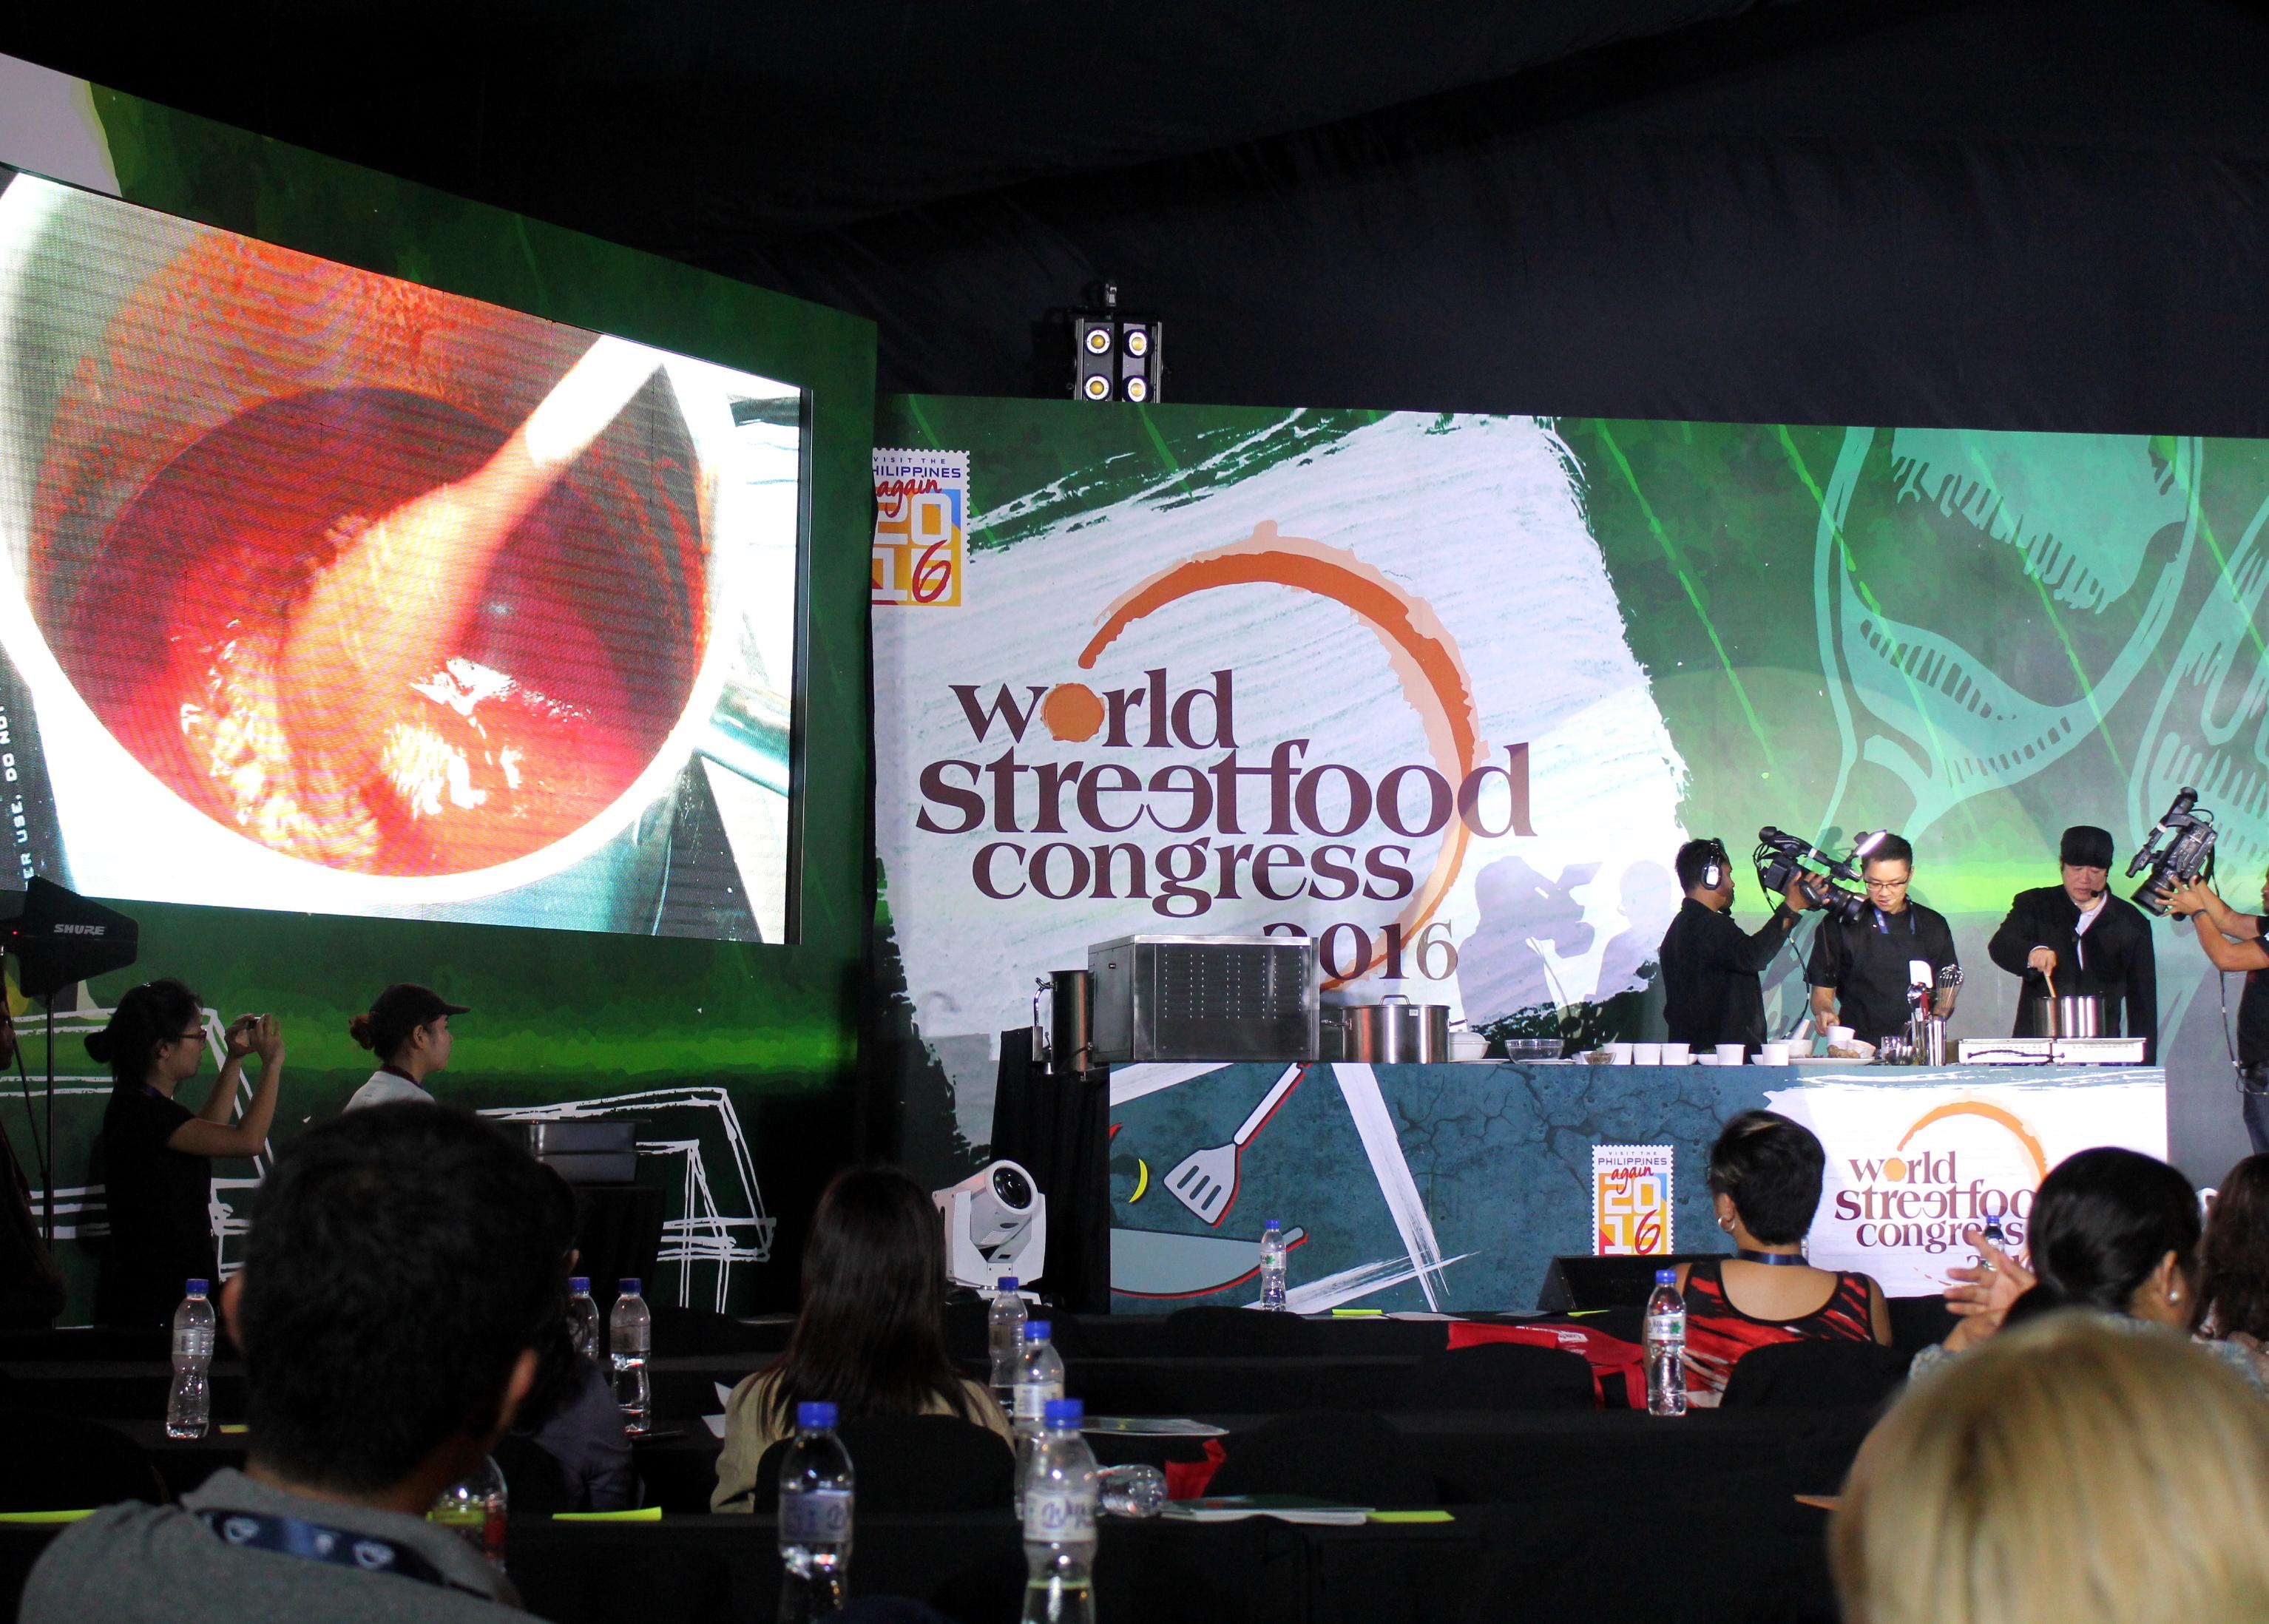 world-street-food-congress-food-demo